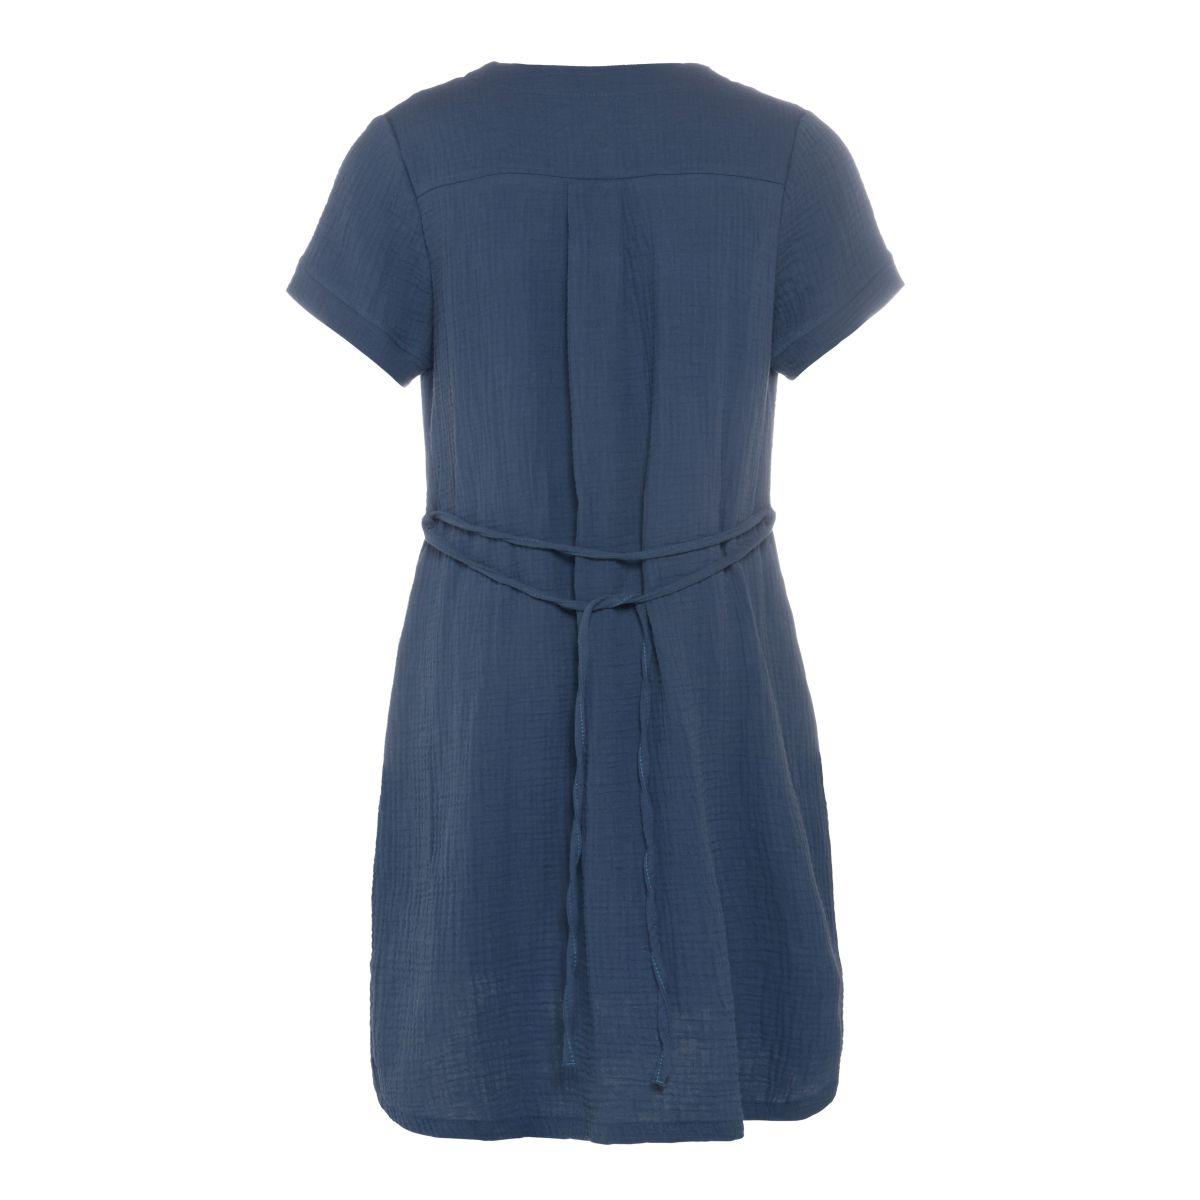 knit factory kf15012001351 indy jurk jeans l 2